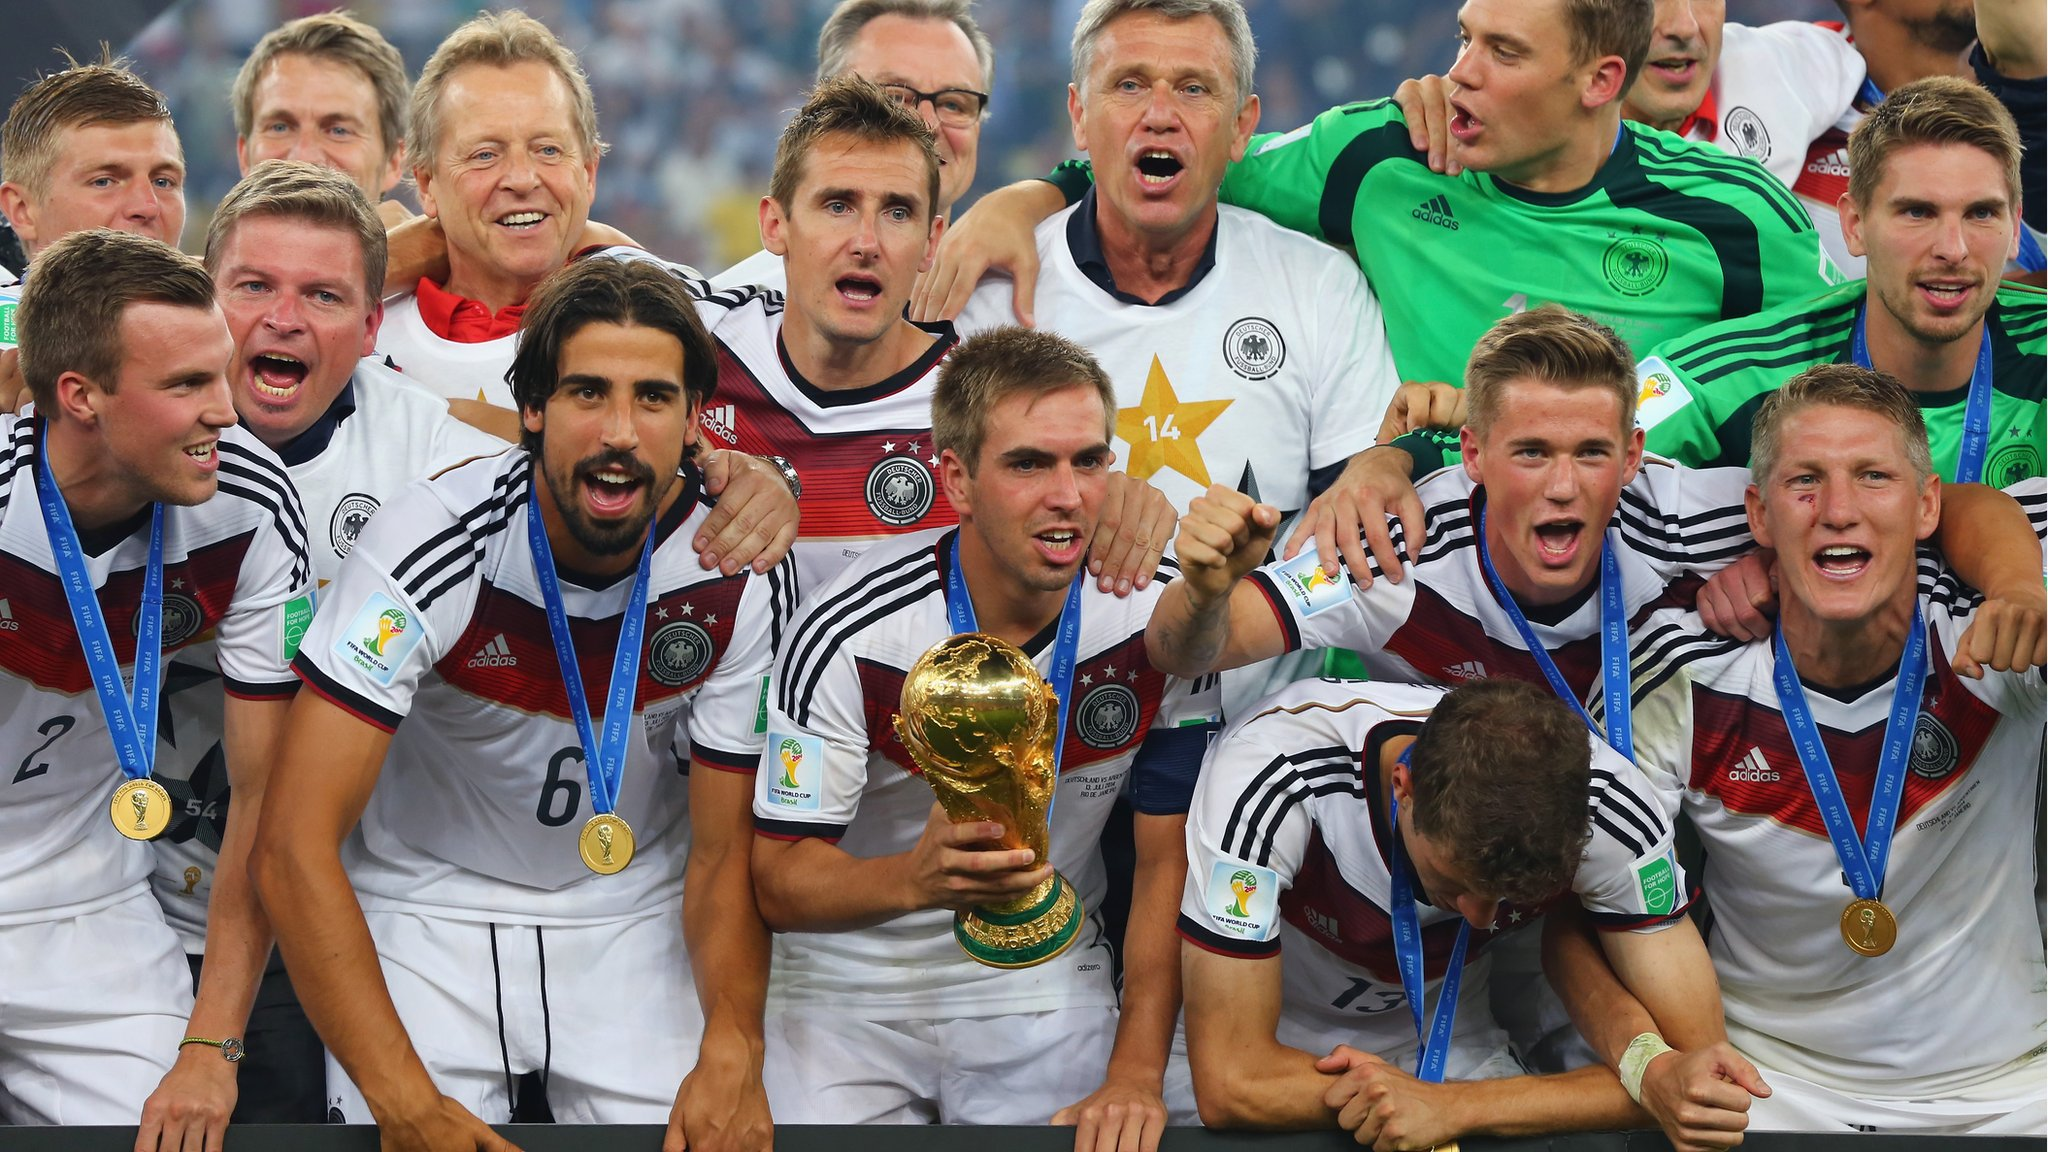 World Cup 2018: Philipp Lahm on winning in 2014, retiring, Joachim Low & England